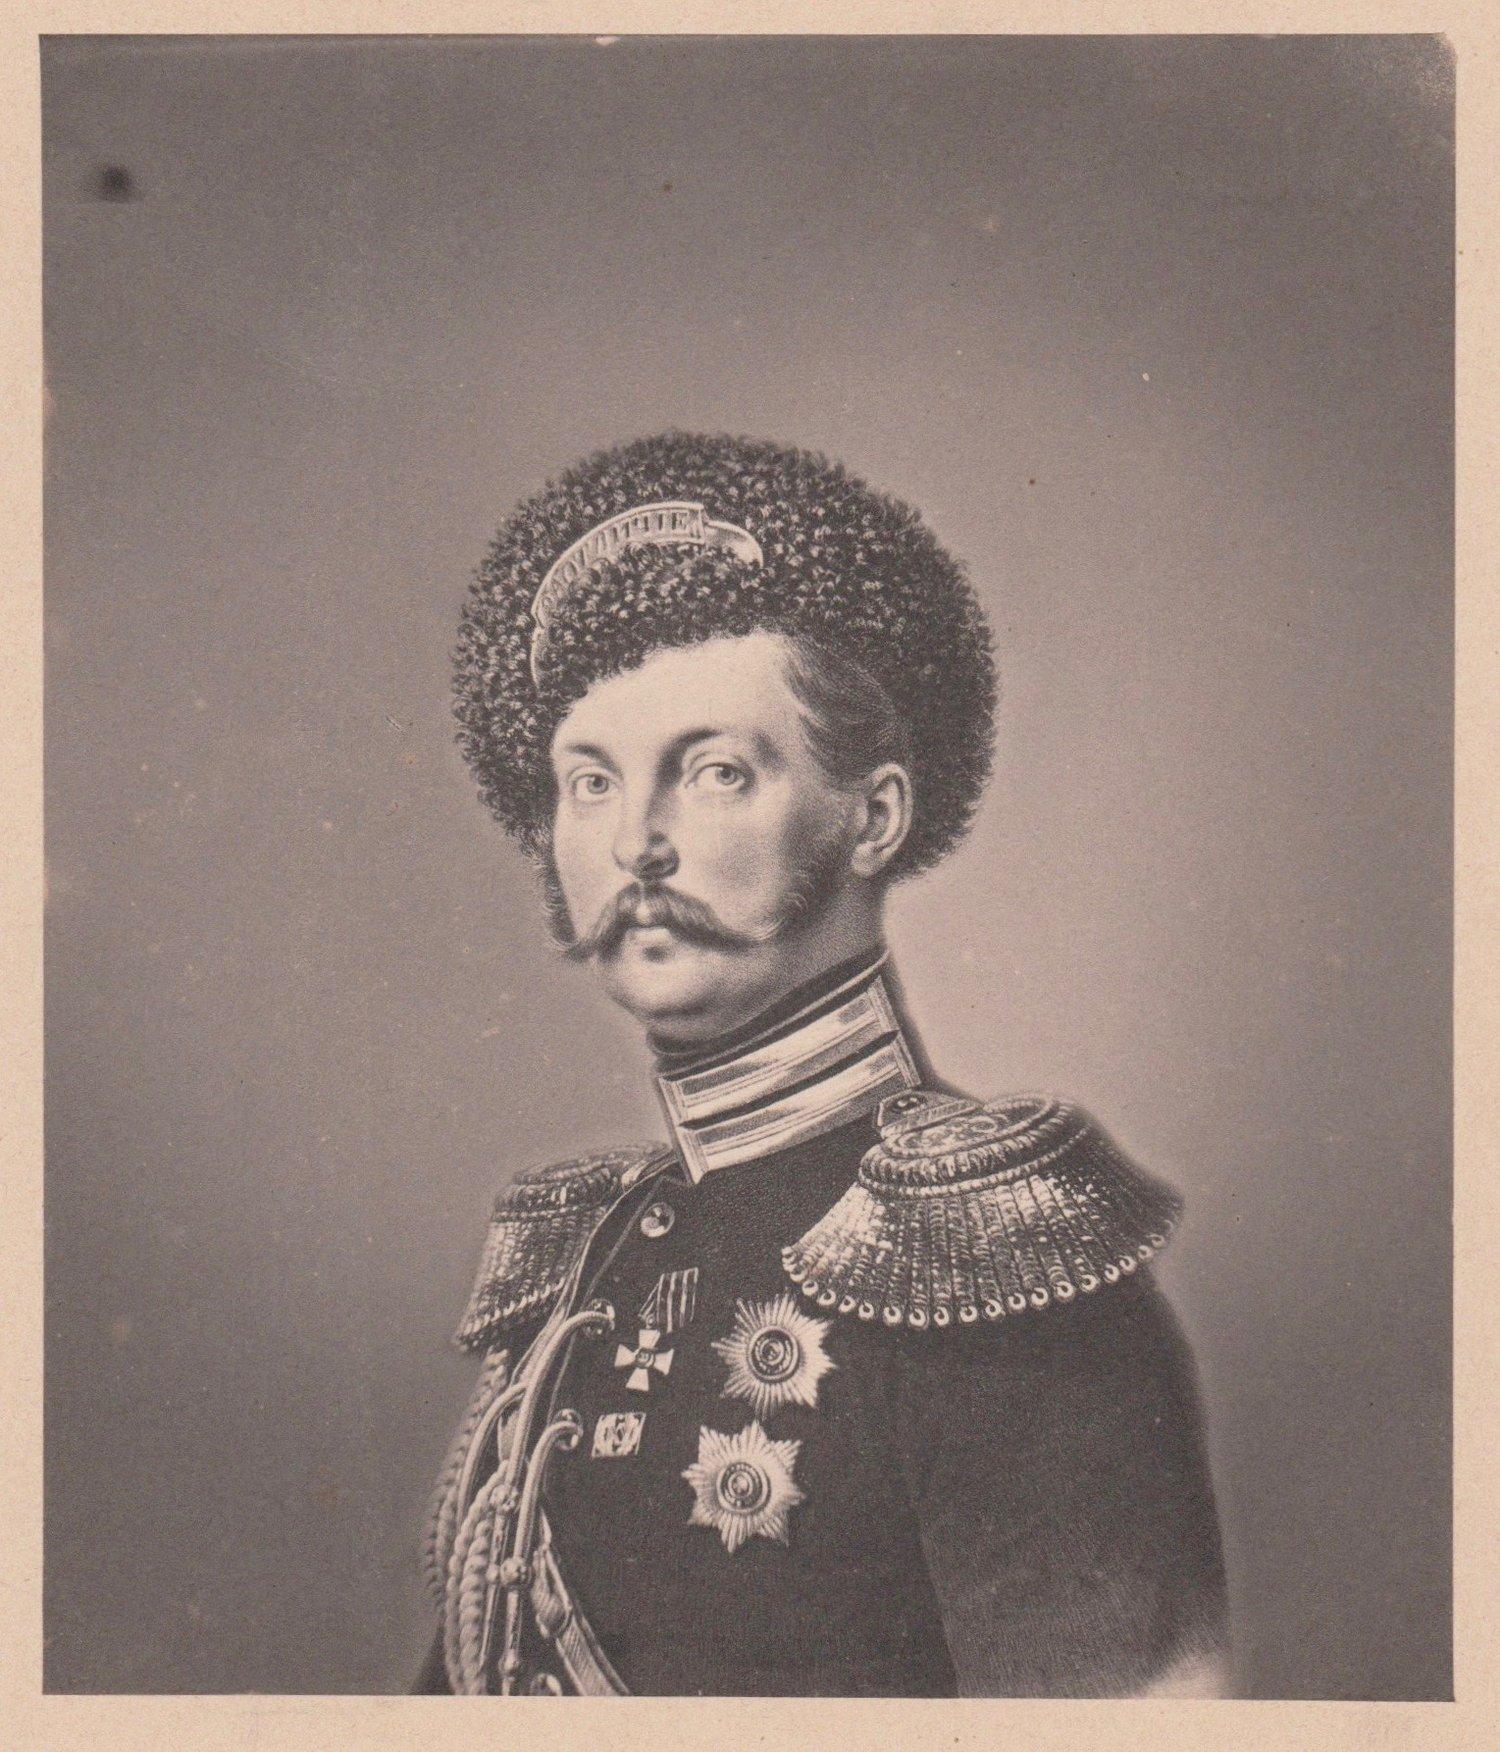 Image of Tsar Alexander II, salt print of a mezzotint, St.-Petersbourg ca. 1856